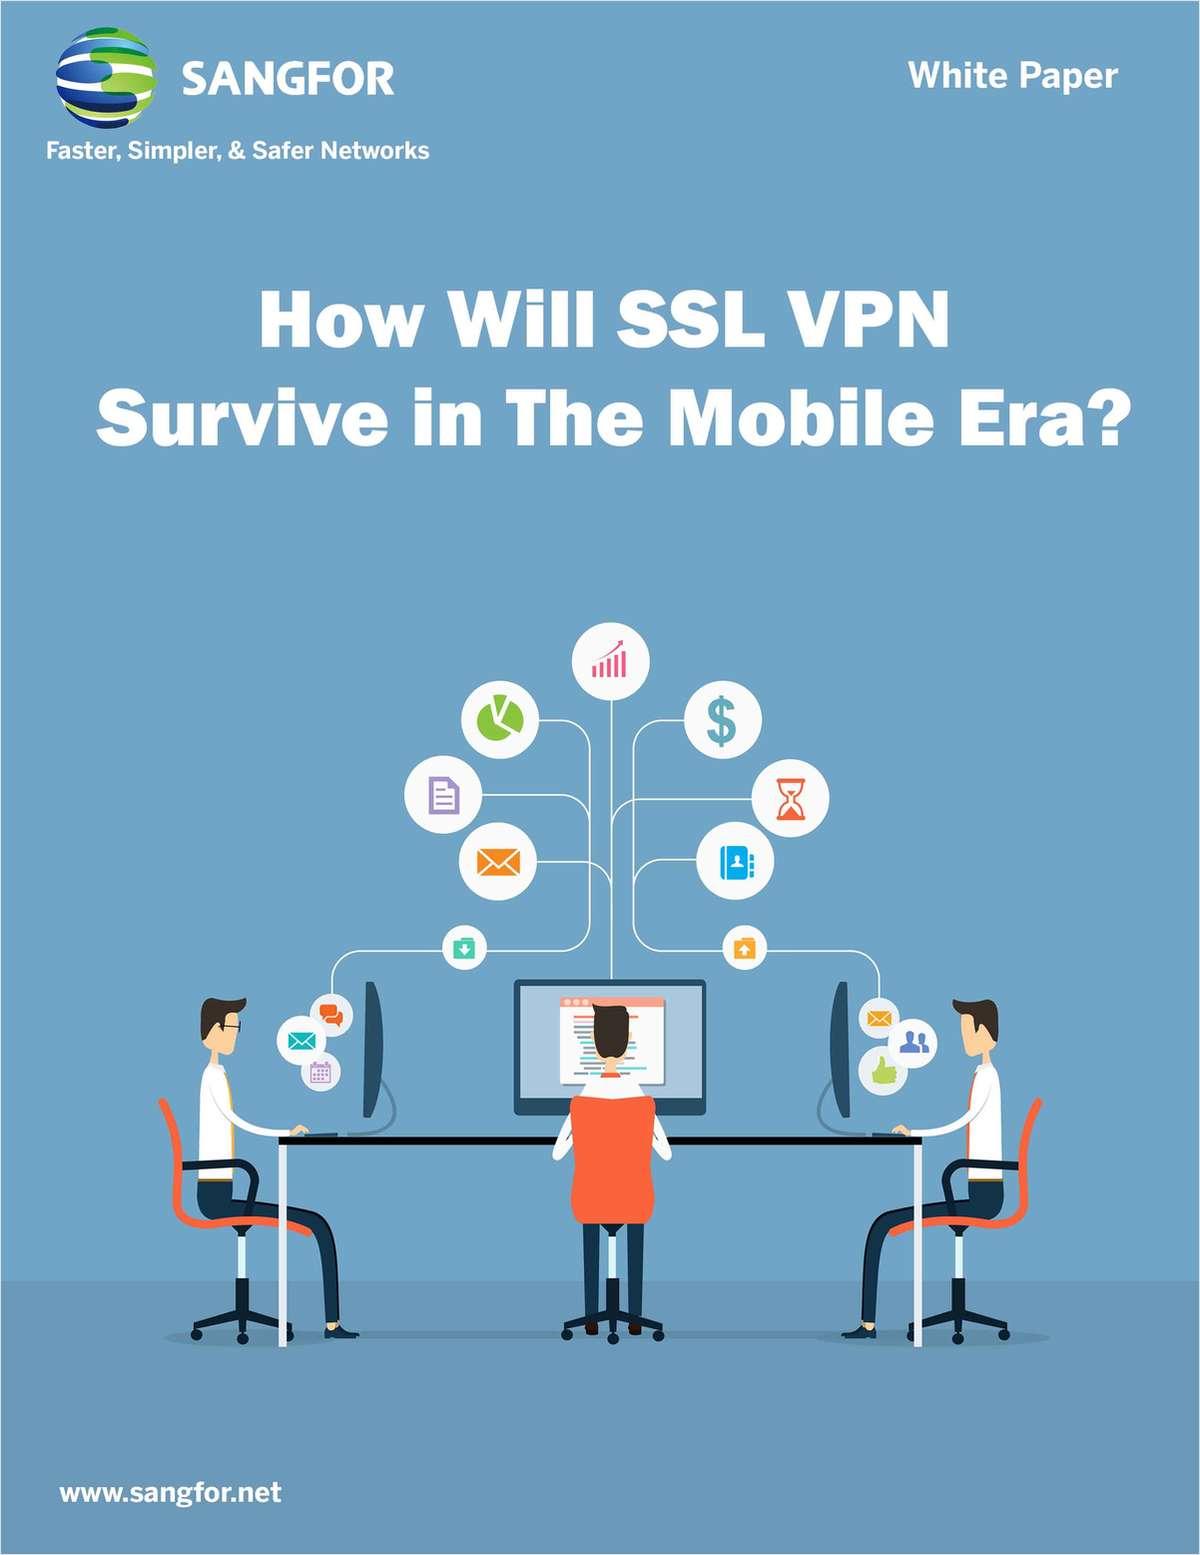 How Will SSL VPN Survive in The Mobile Era?